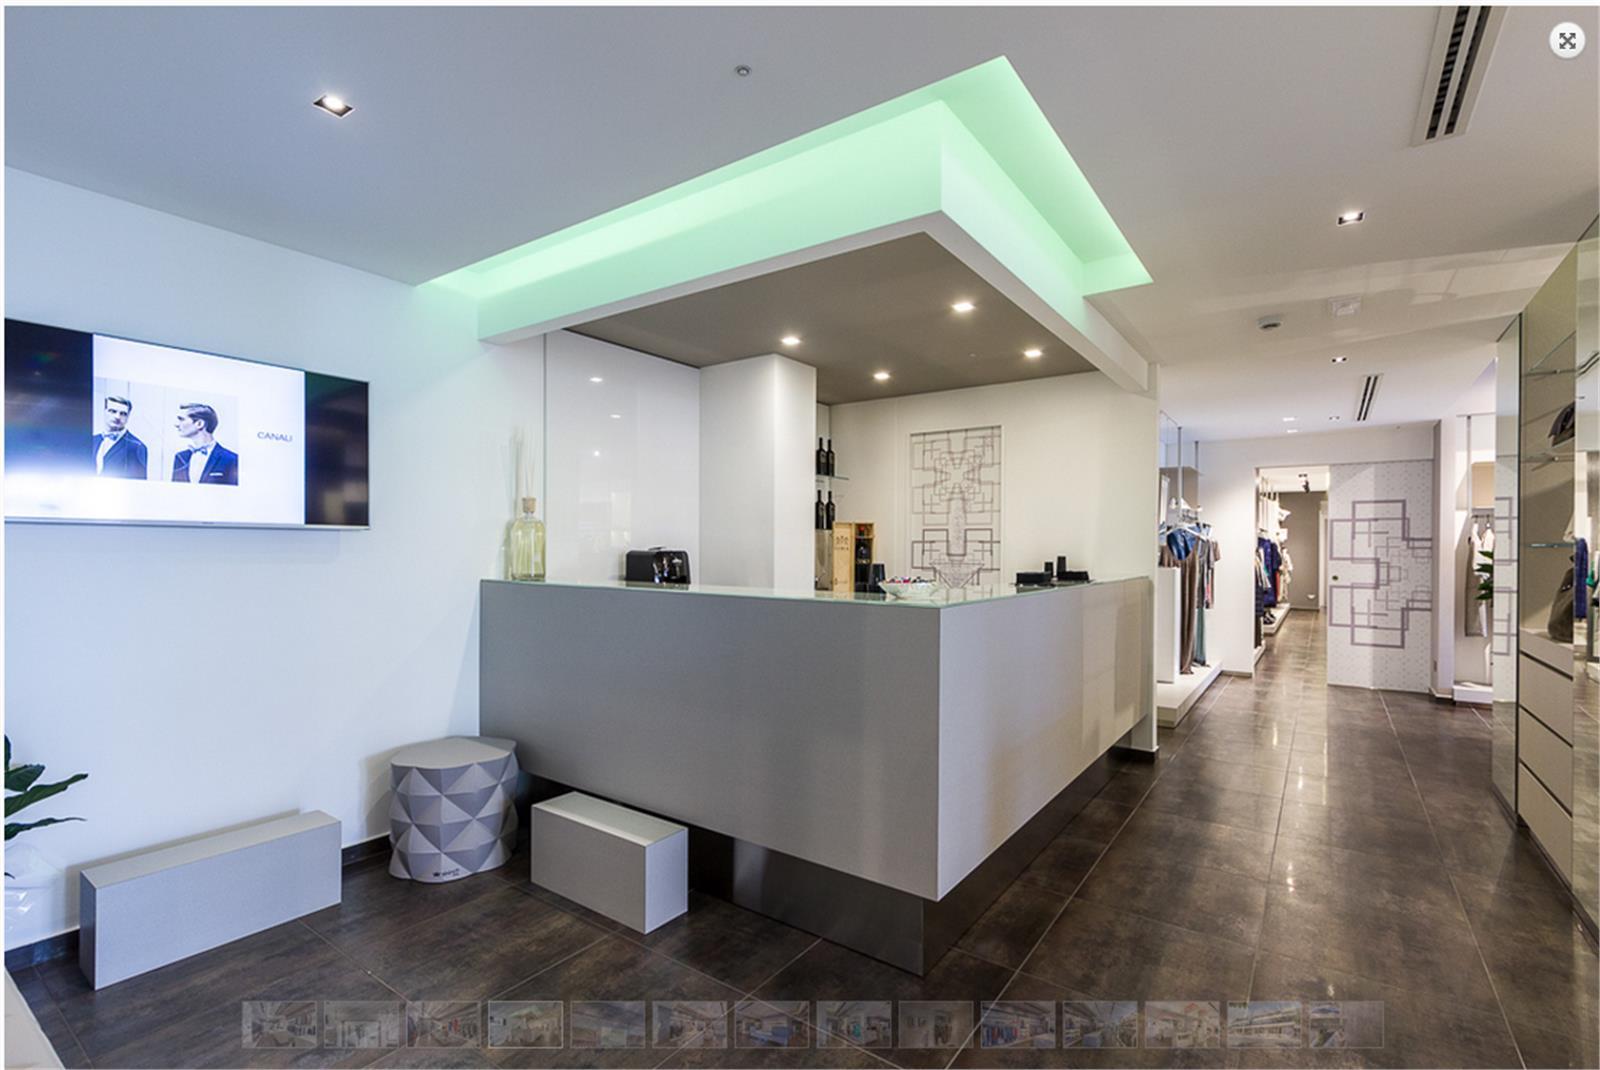 Ud studio architecte d 39 int rieur design immobilier editus for Emploi design interieur